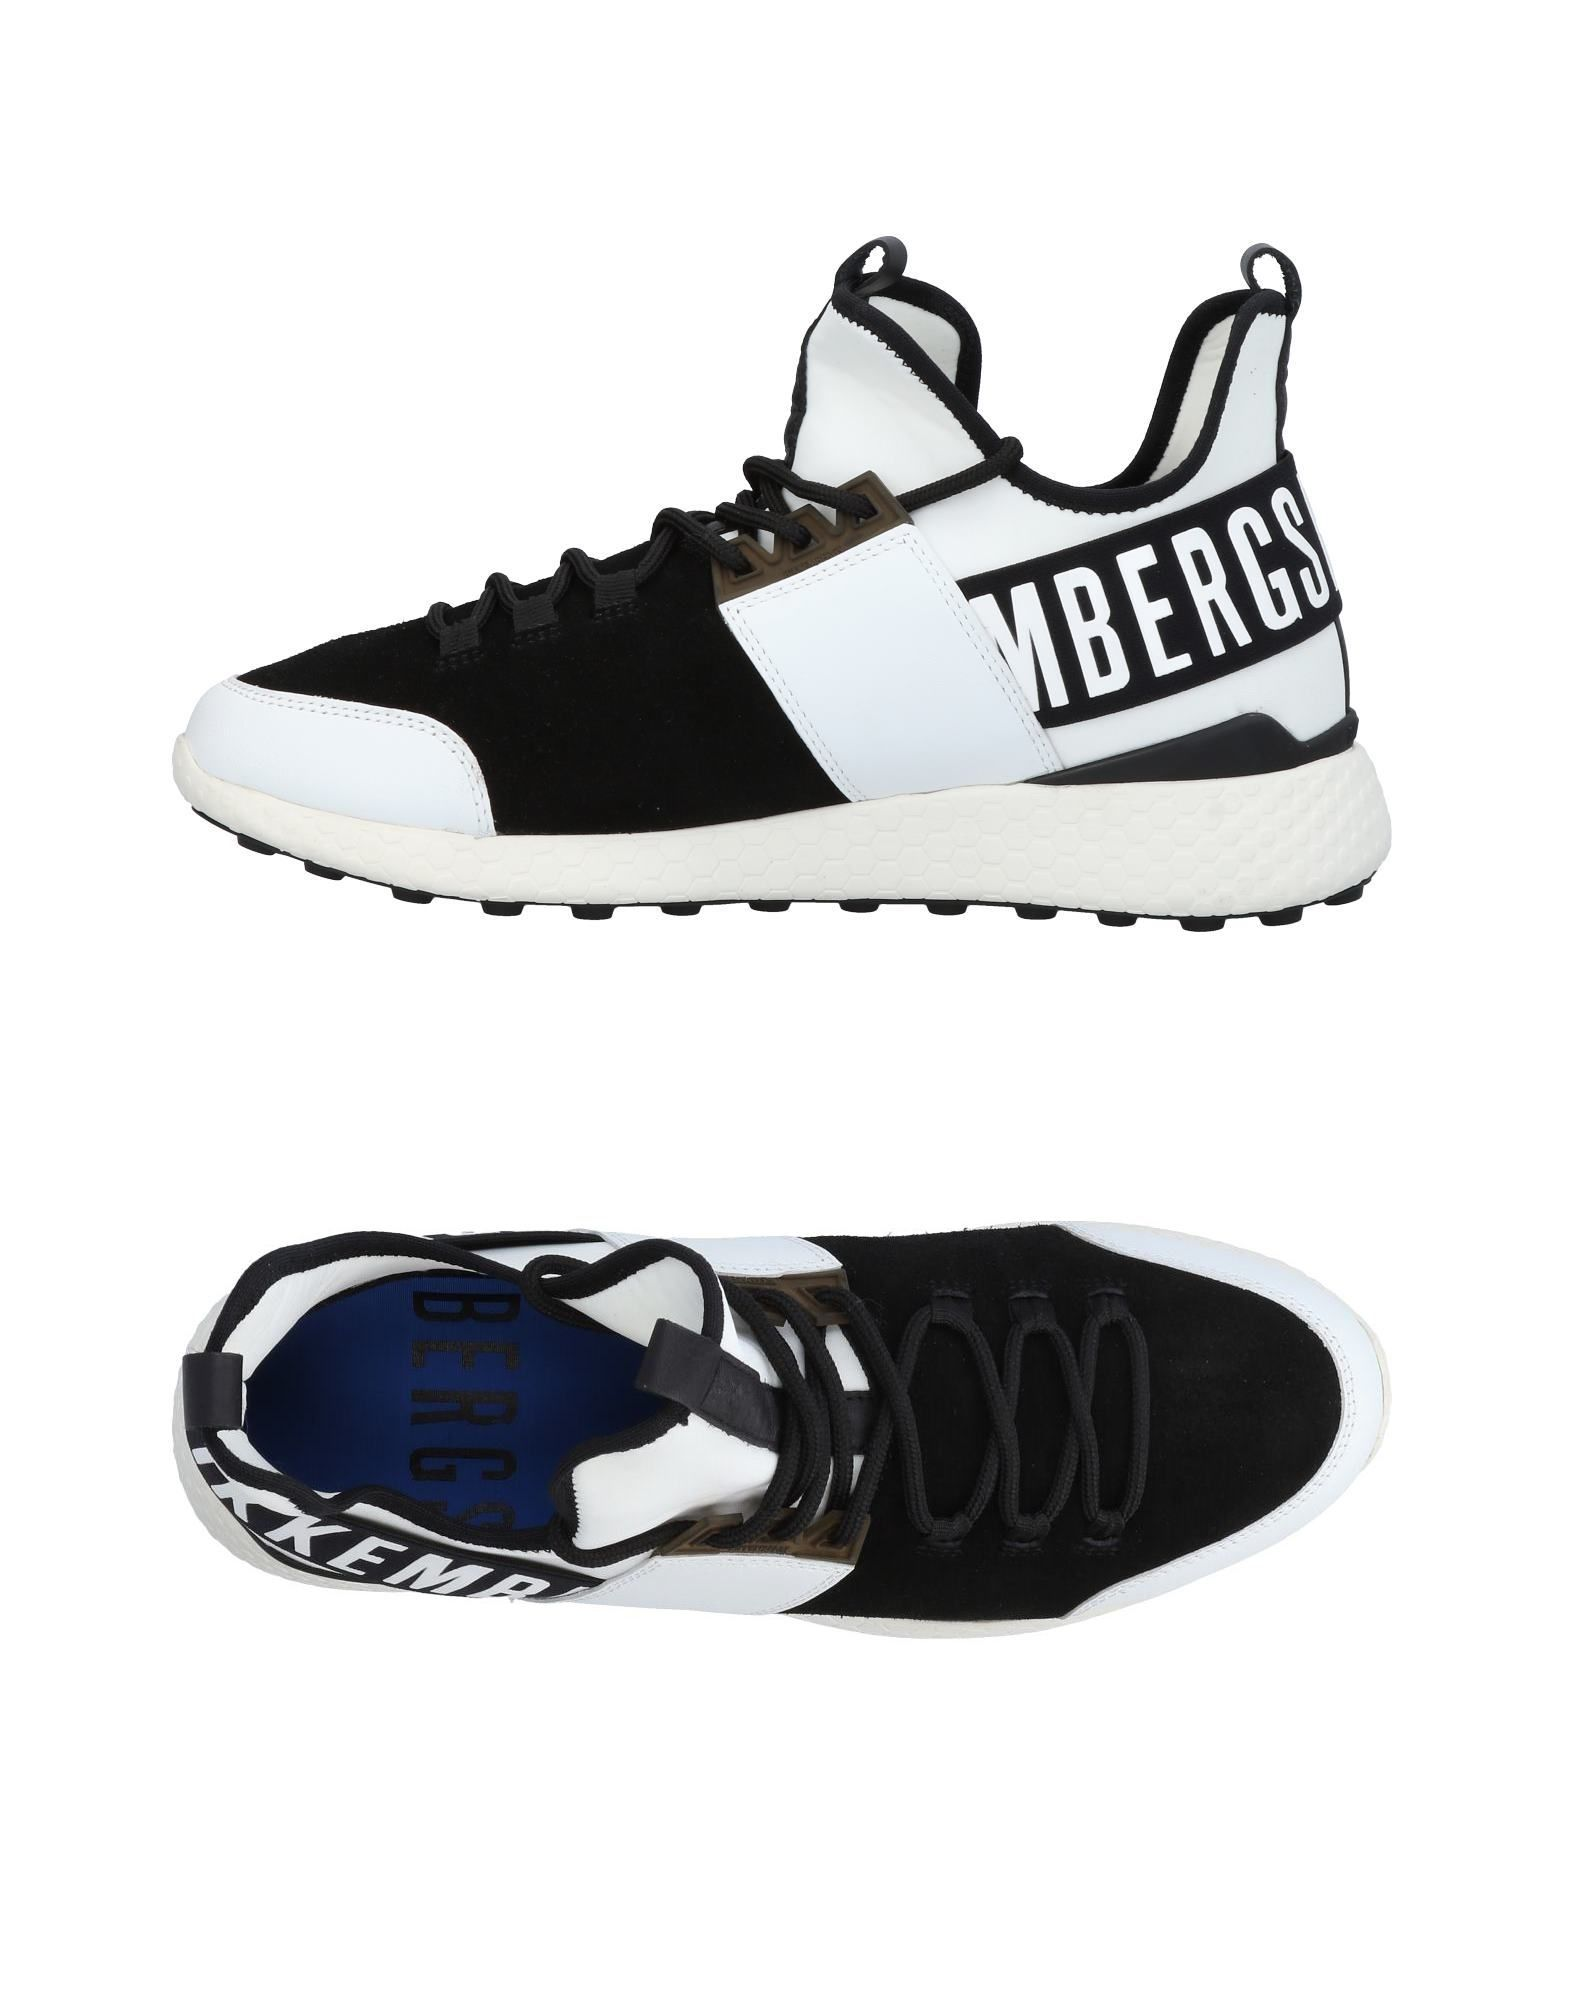 A buon mercato Sneakers Bikkembergs Uomo - 11450868GB